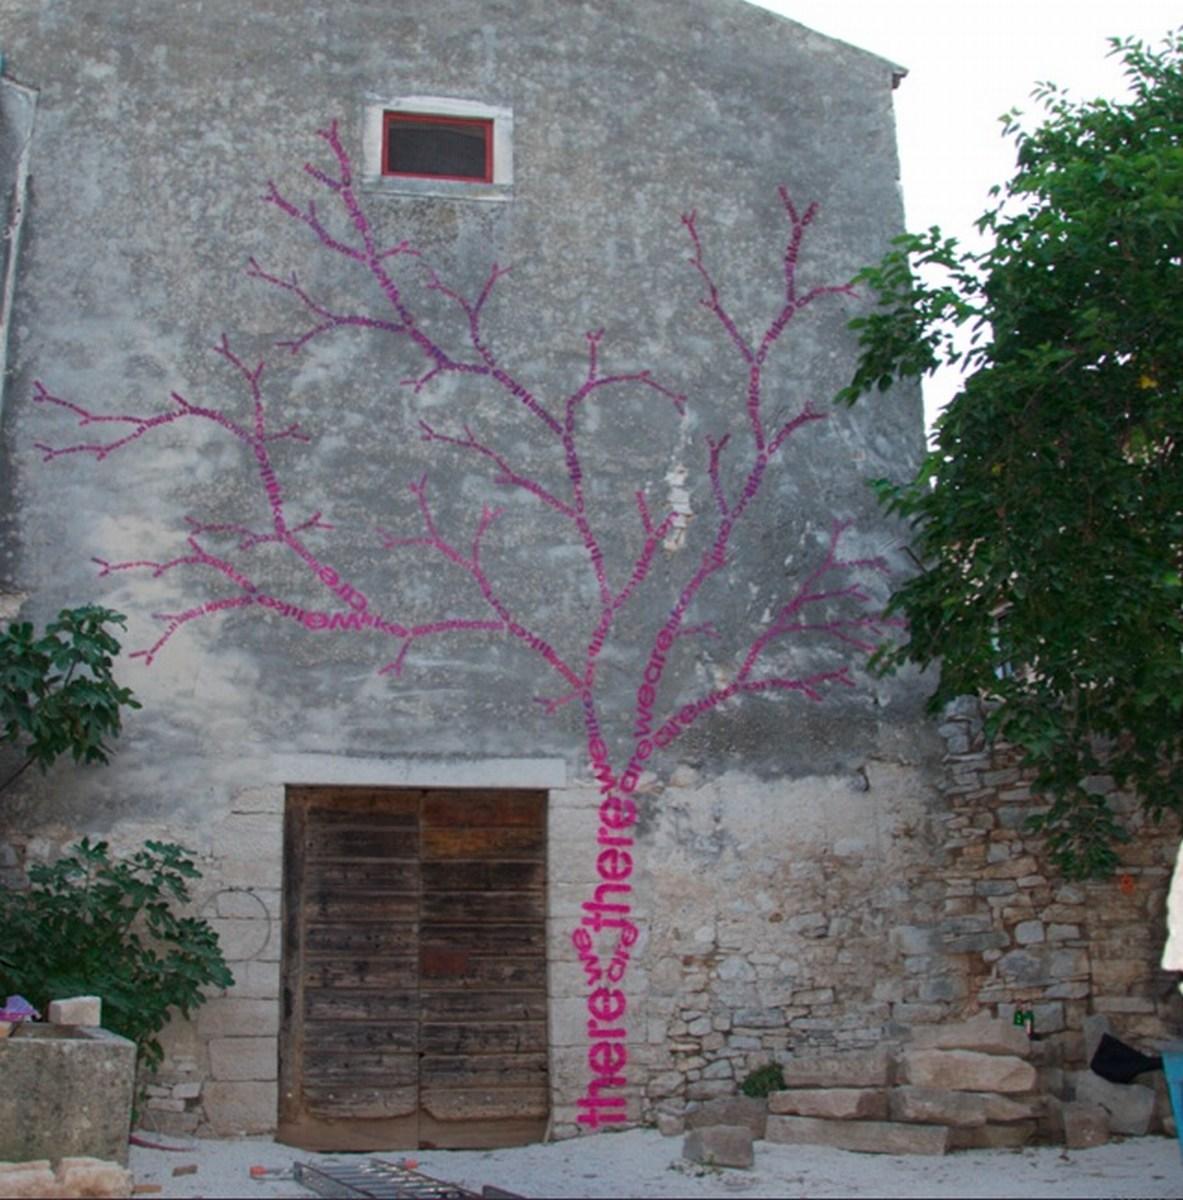 Opiemme-Tree-of-words-Tribute-to-Ungaretti-Vodnjan-Sobe-Festival-Croatia-2012-3